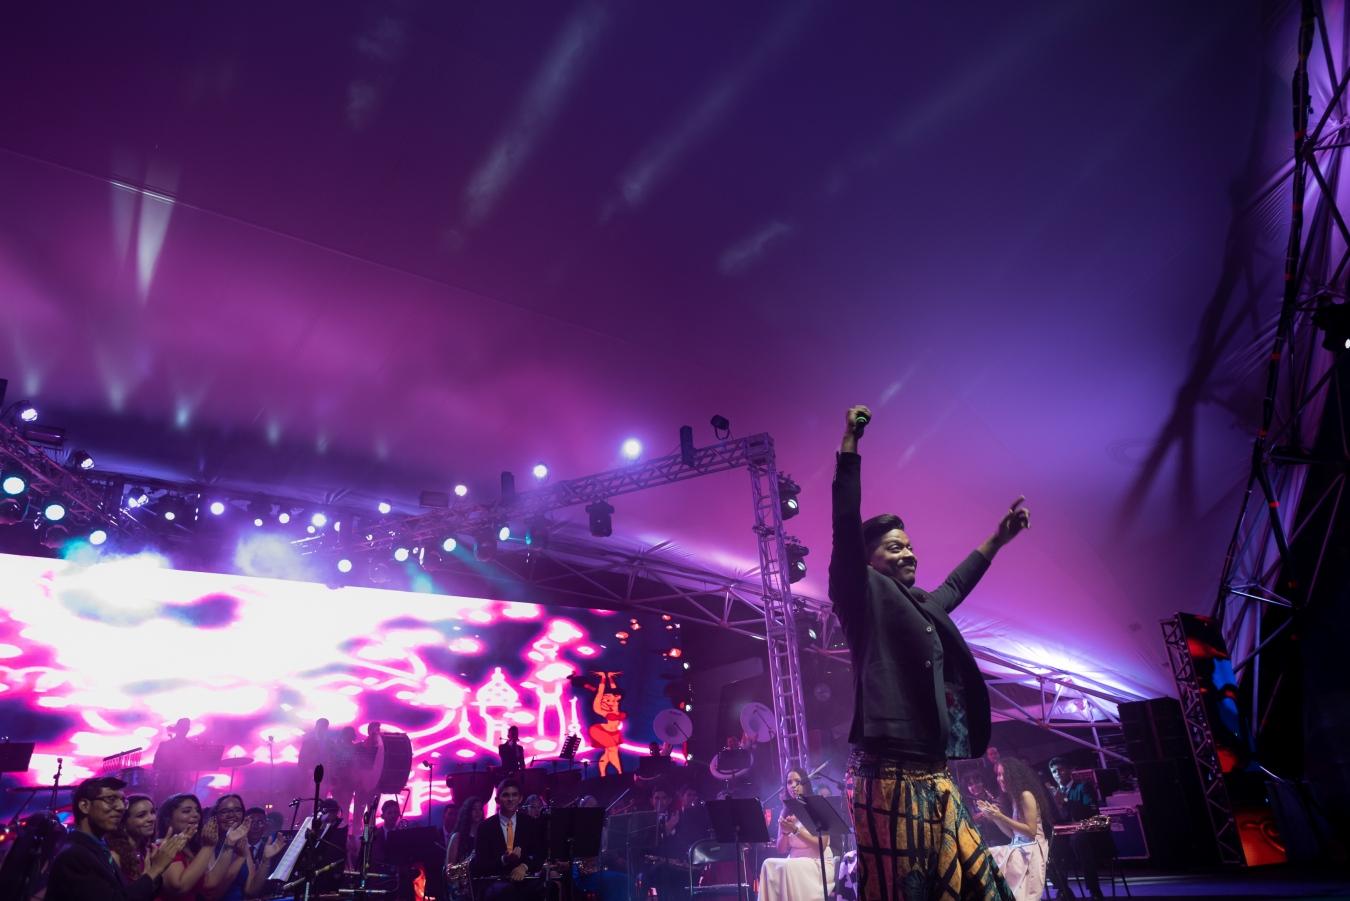 Musicalion - Eduard Serra documental cultura music singer música Panamá